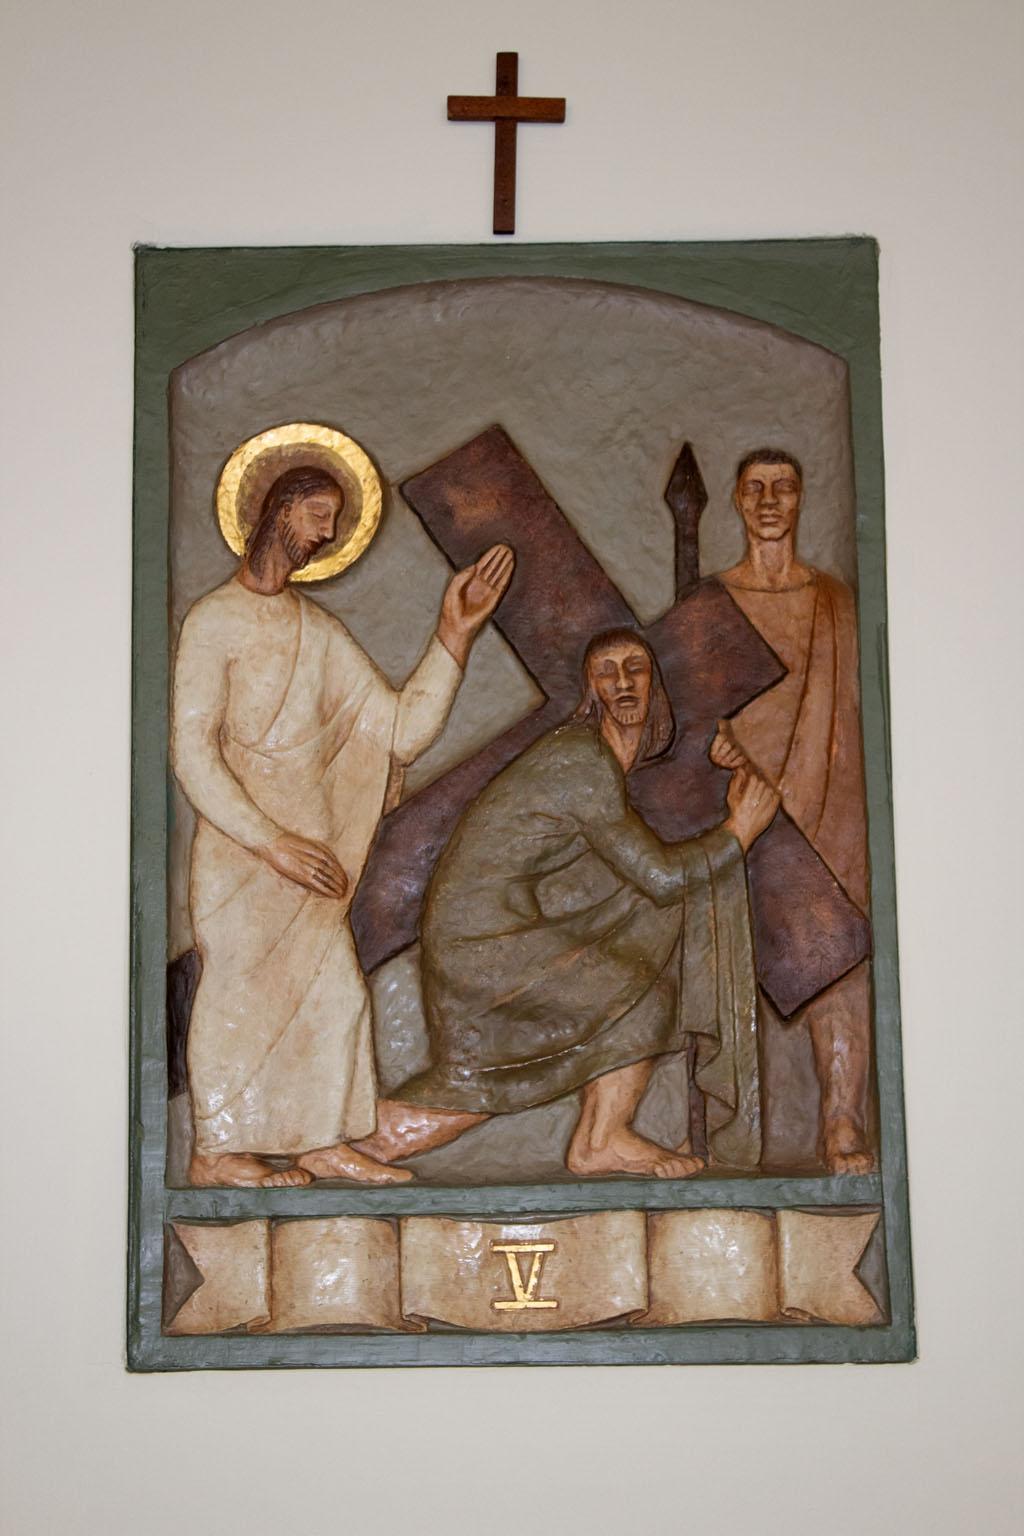 Fifth Station of the cross by Dora de Pédery Hunt